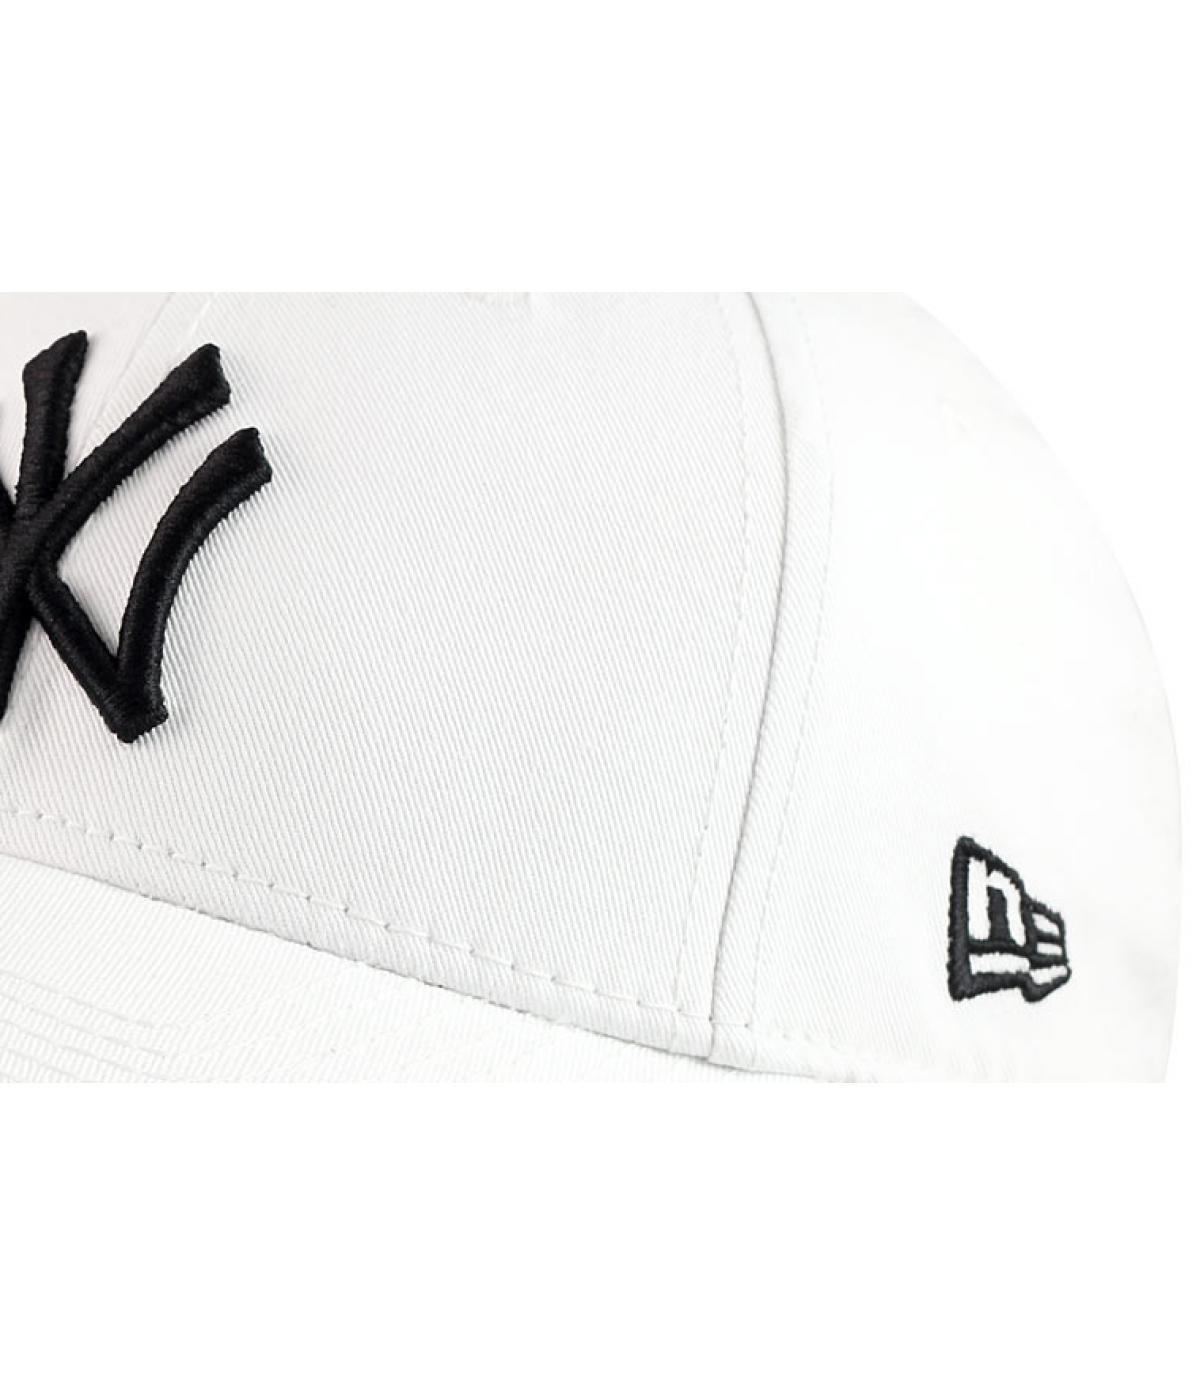 White trucker cap